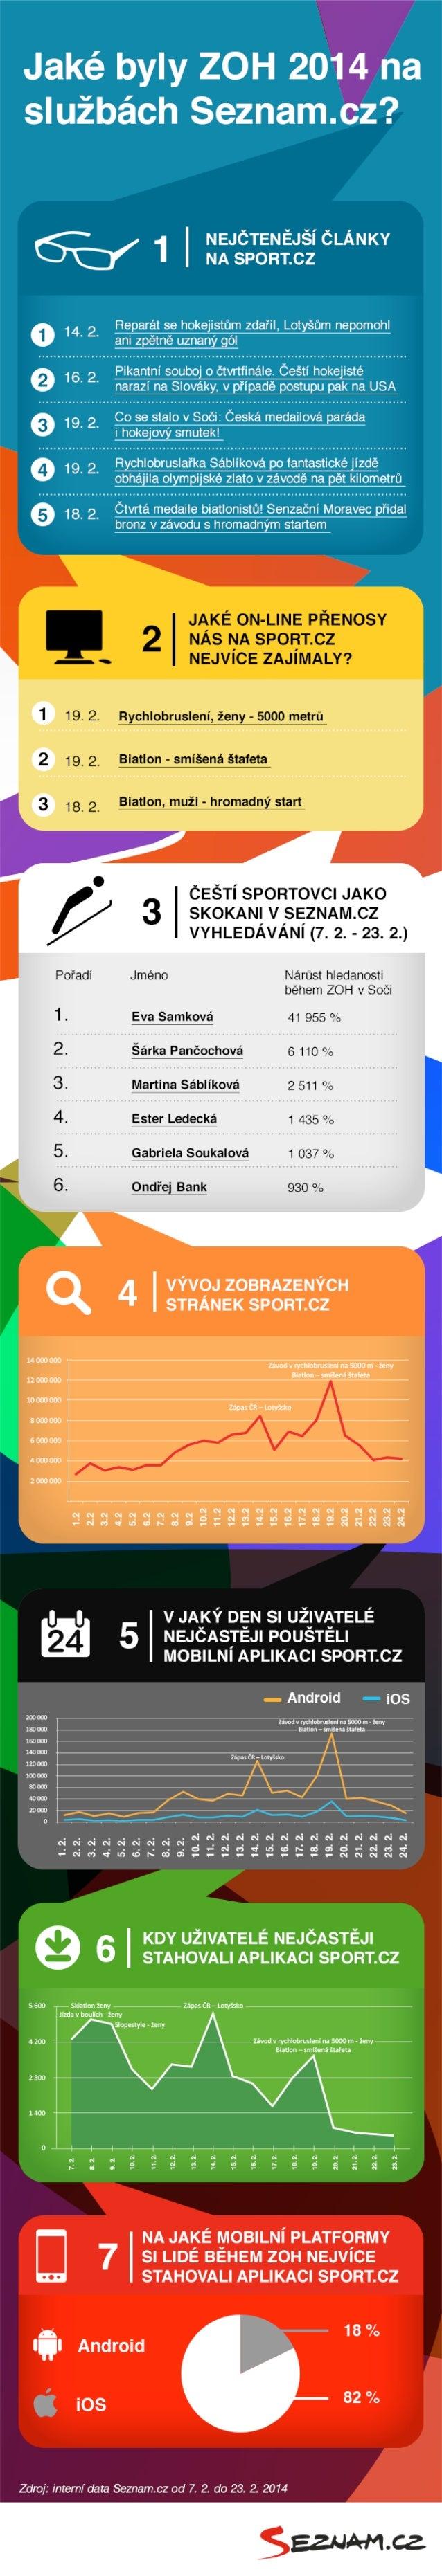 Infografika zoh 2014